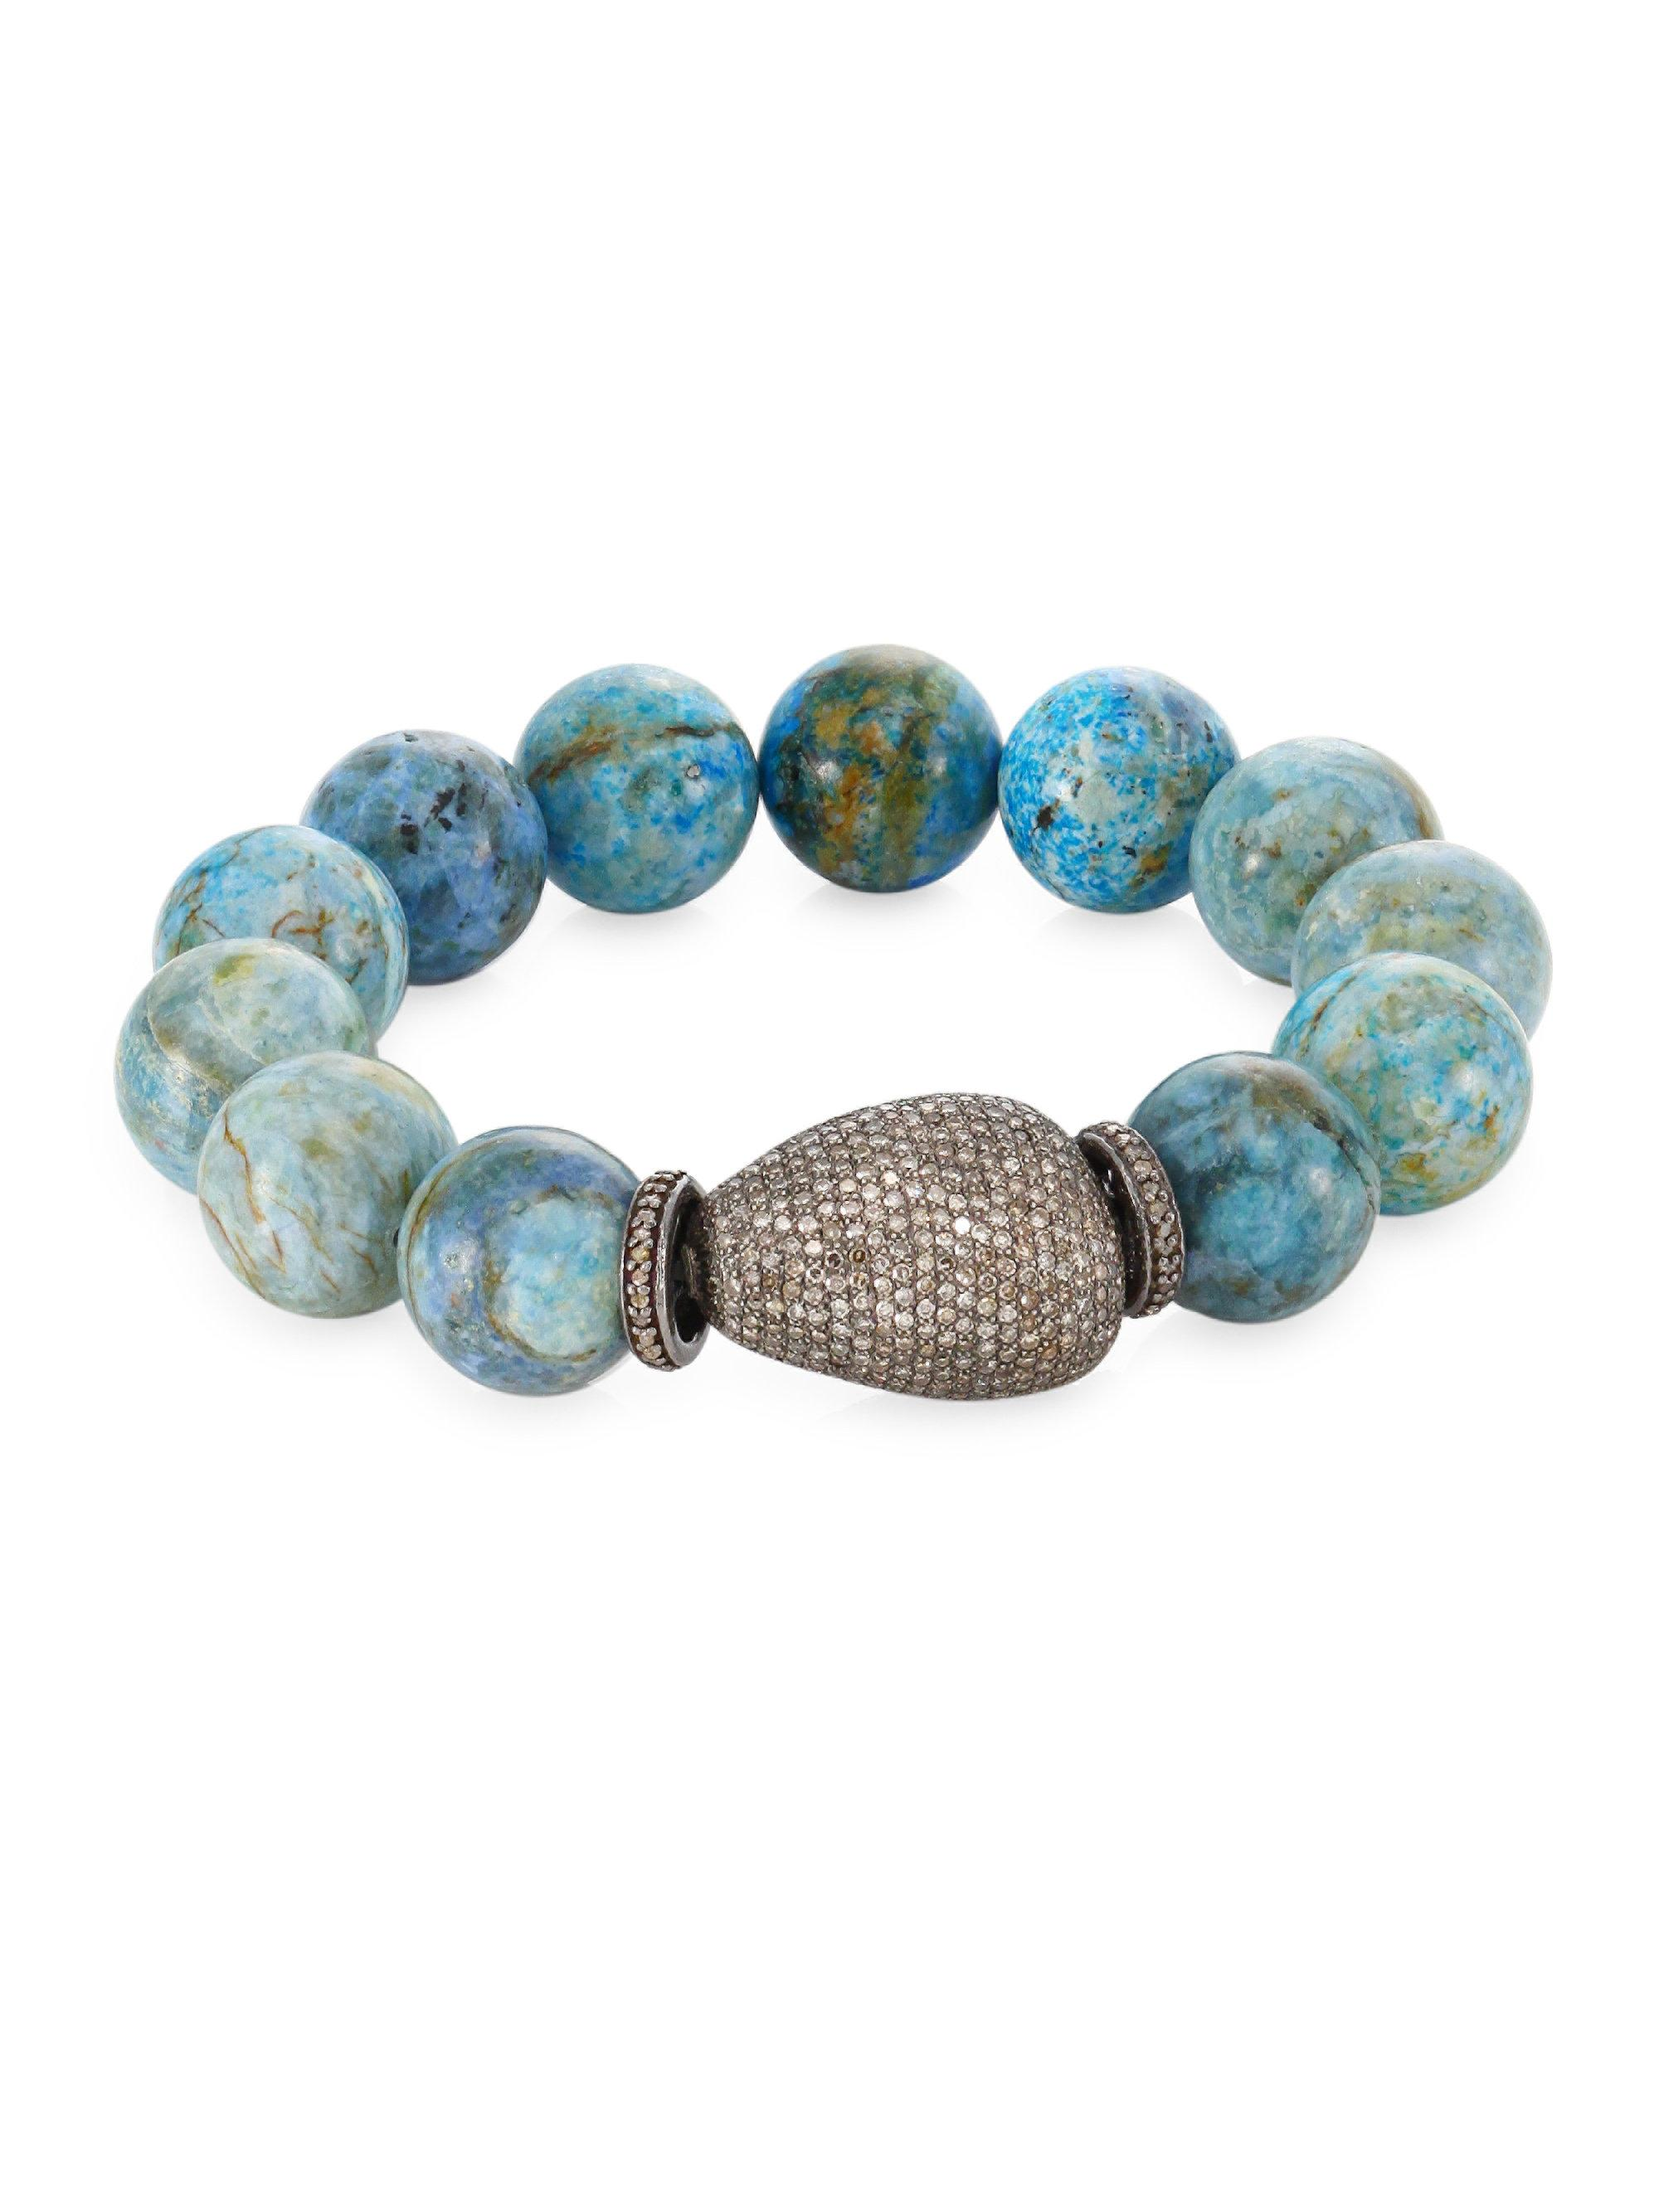 Bavna Tapered Turquoise & Diamond Bangle 57Ejc8